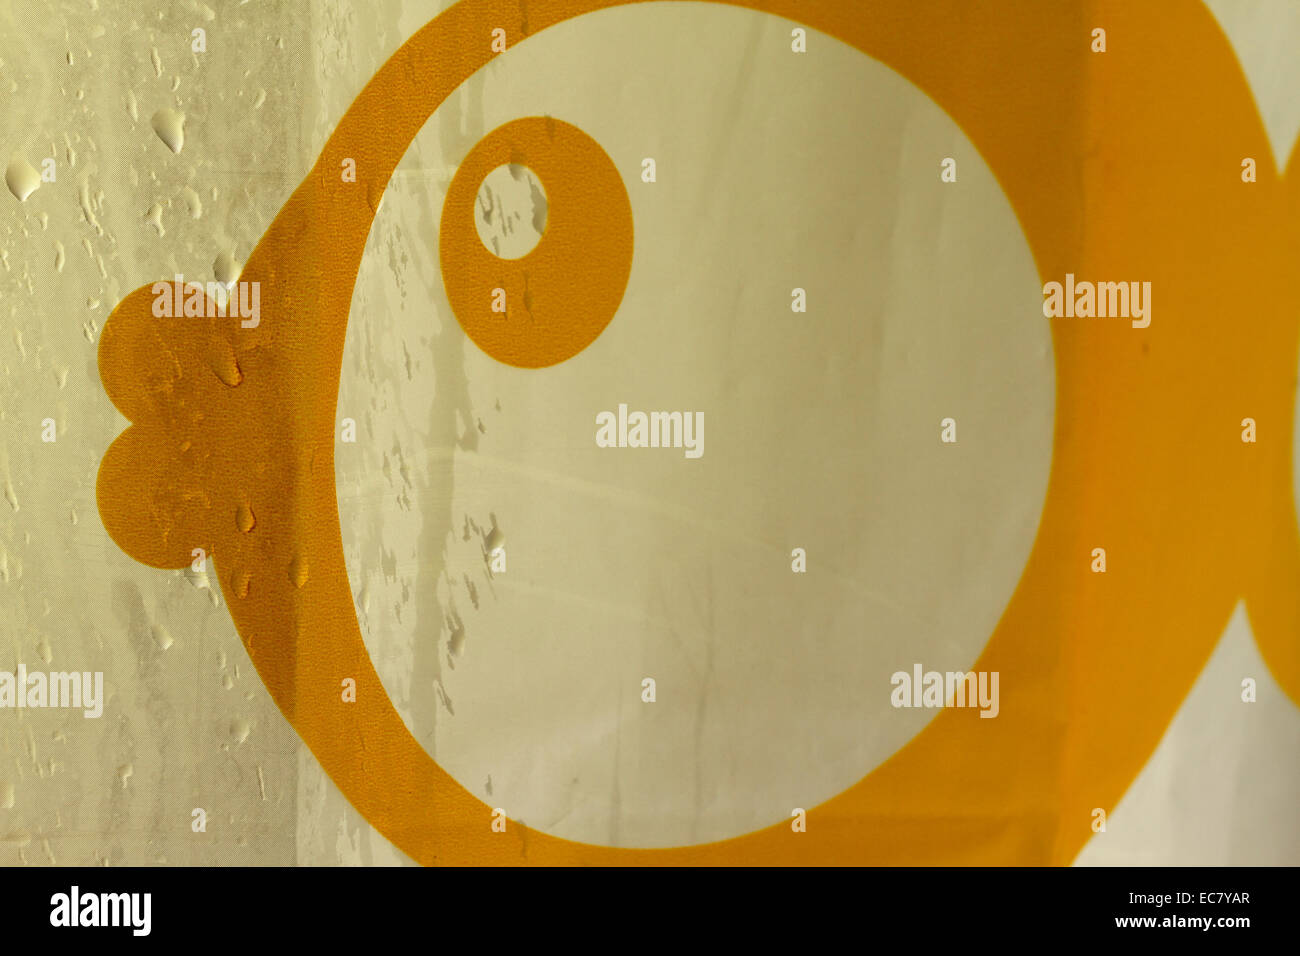 La cortina de la ducha fish gotas de agua cae recortado Imagen De Stock